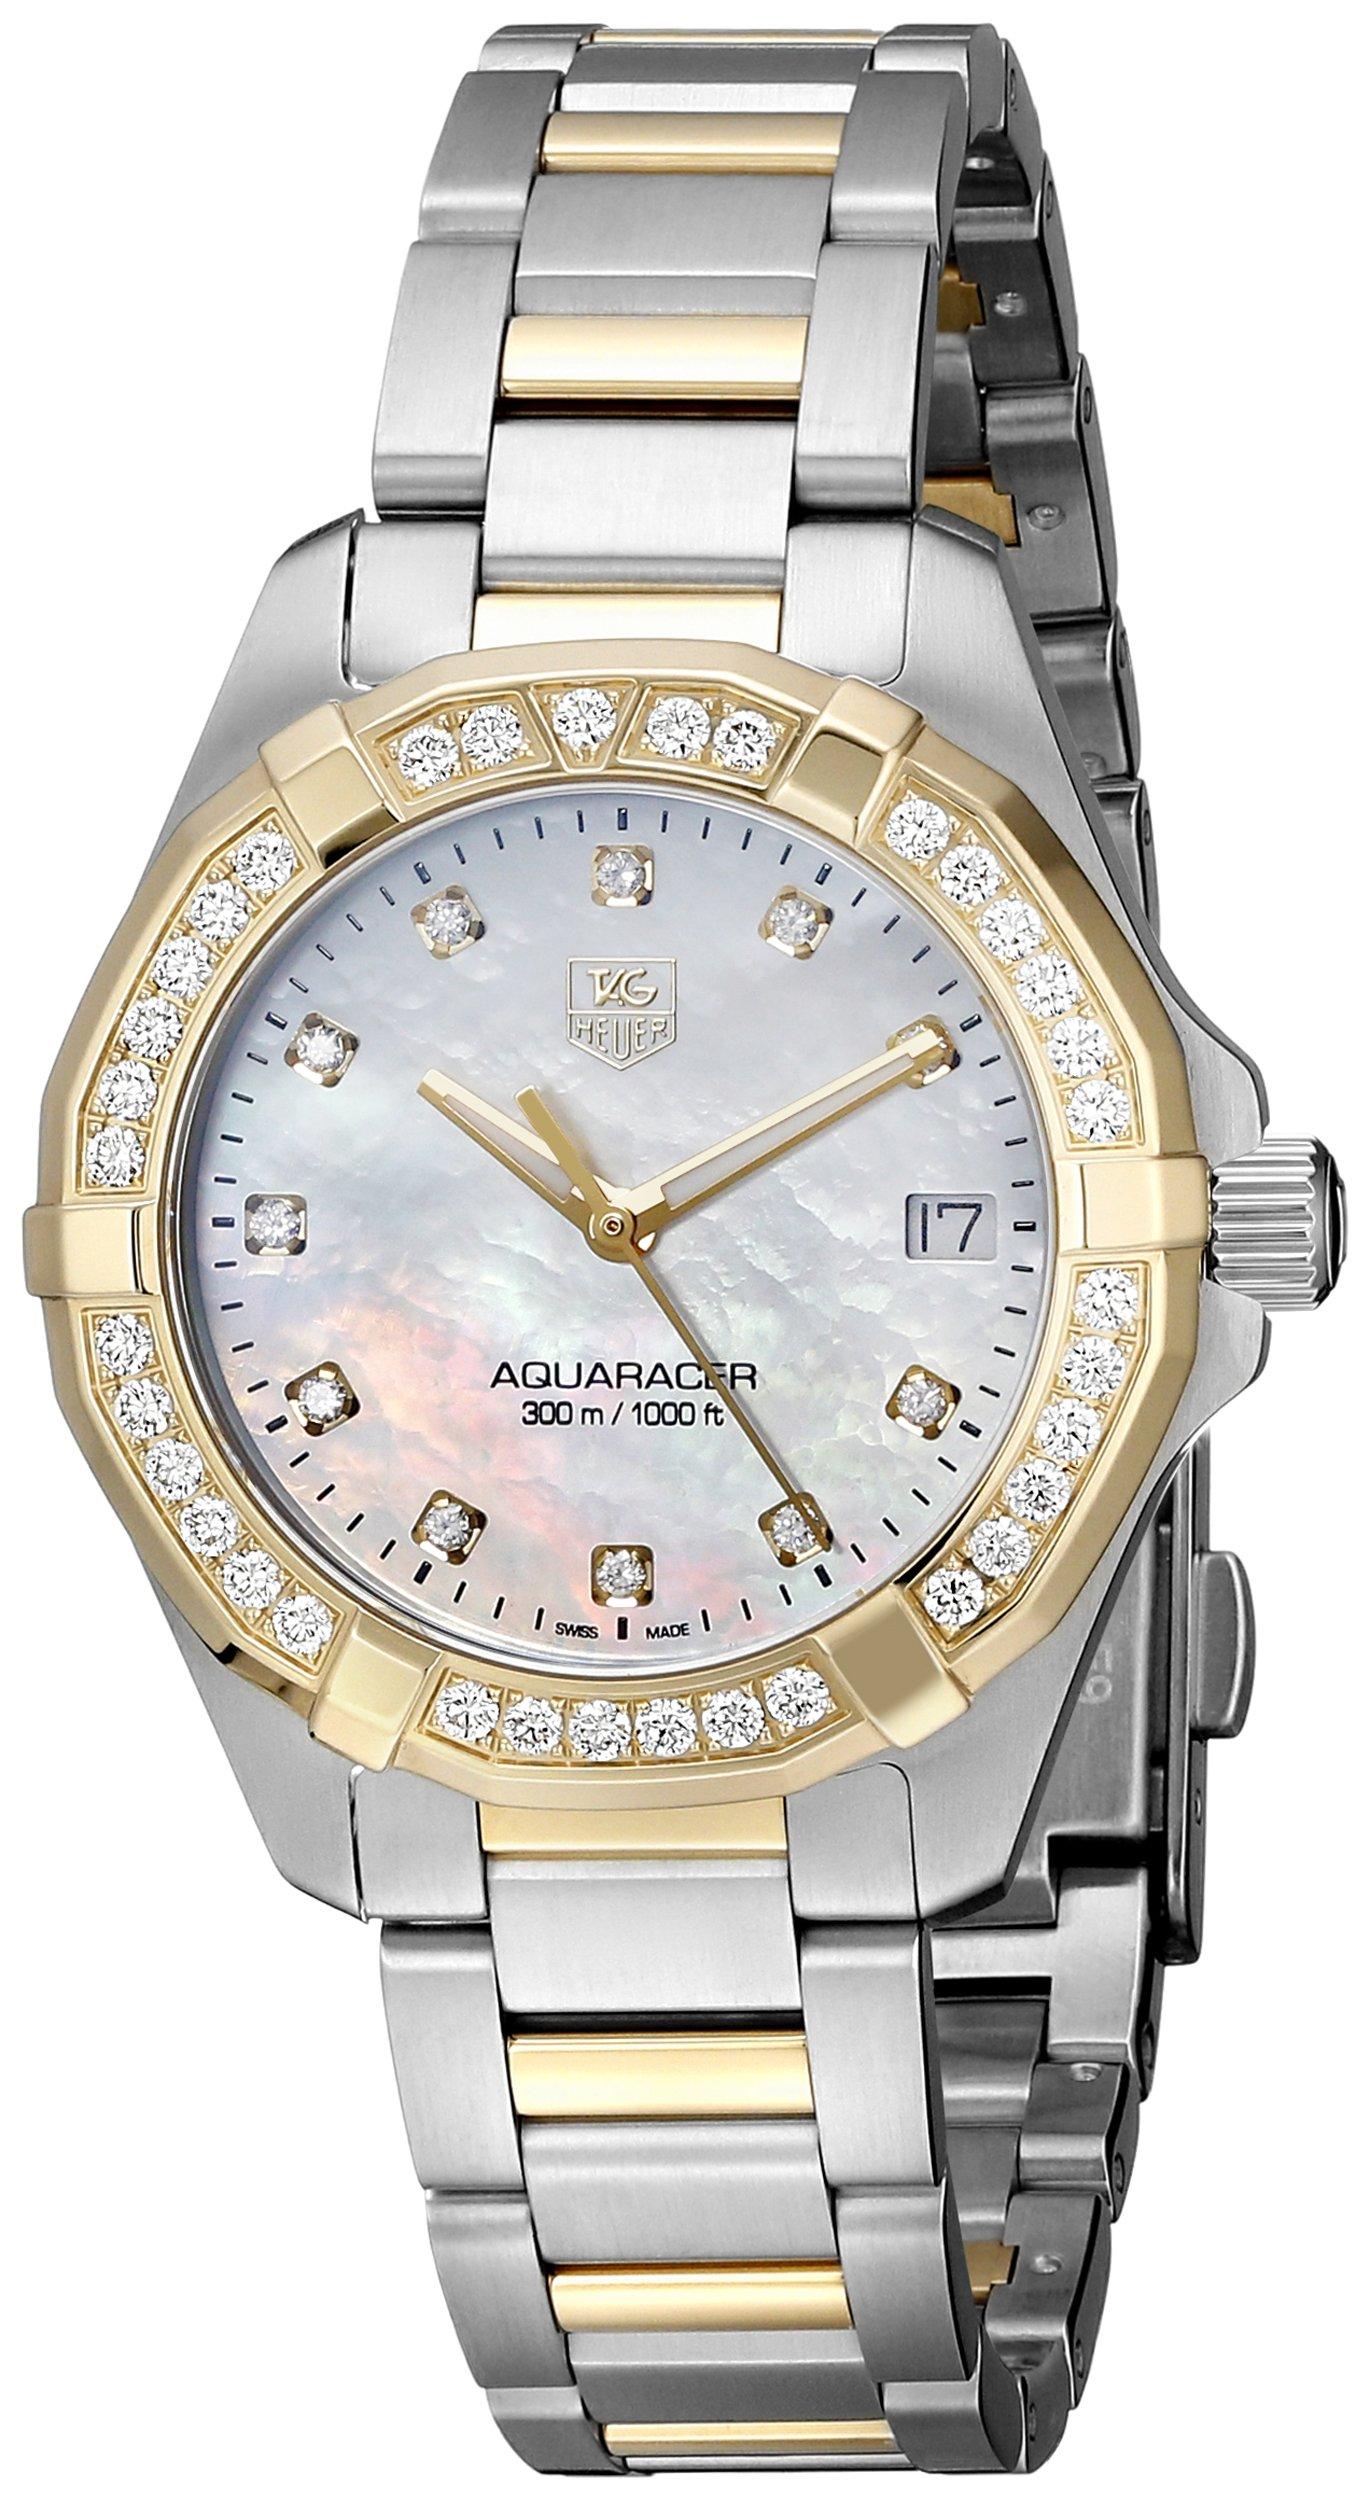 Tag Heuer Women's WAY1353.BD0917 300 Aquaracer Diamond-Accented Two-Tone Watch